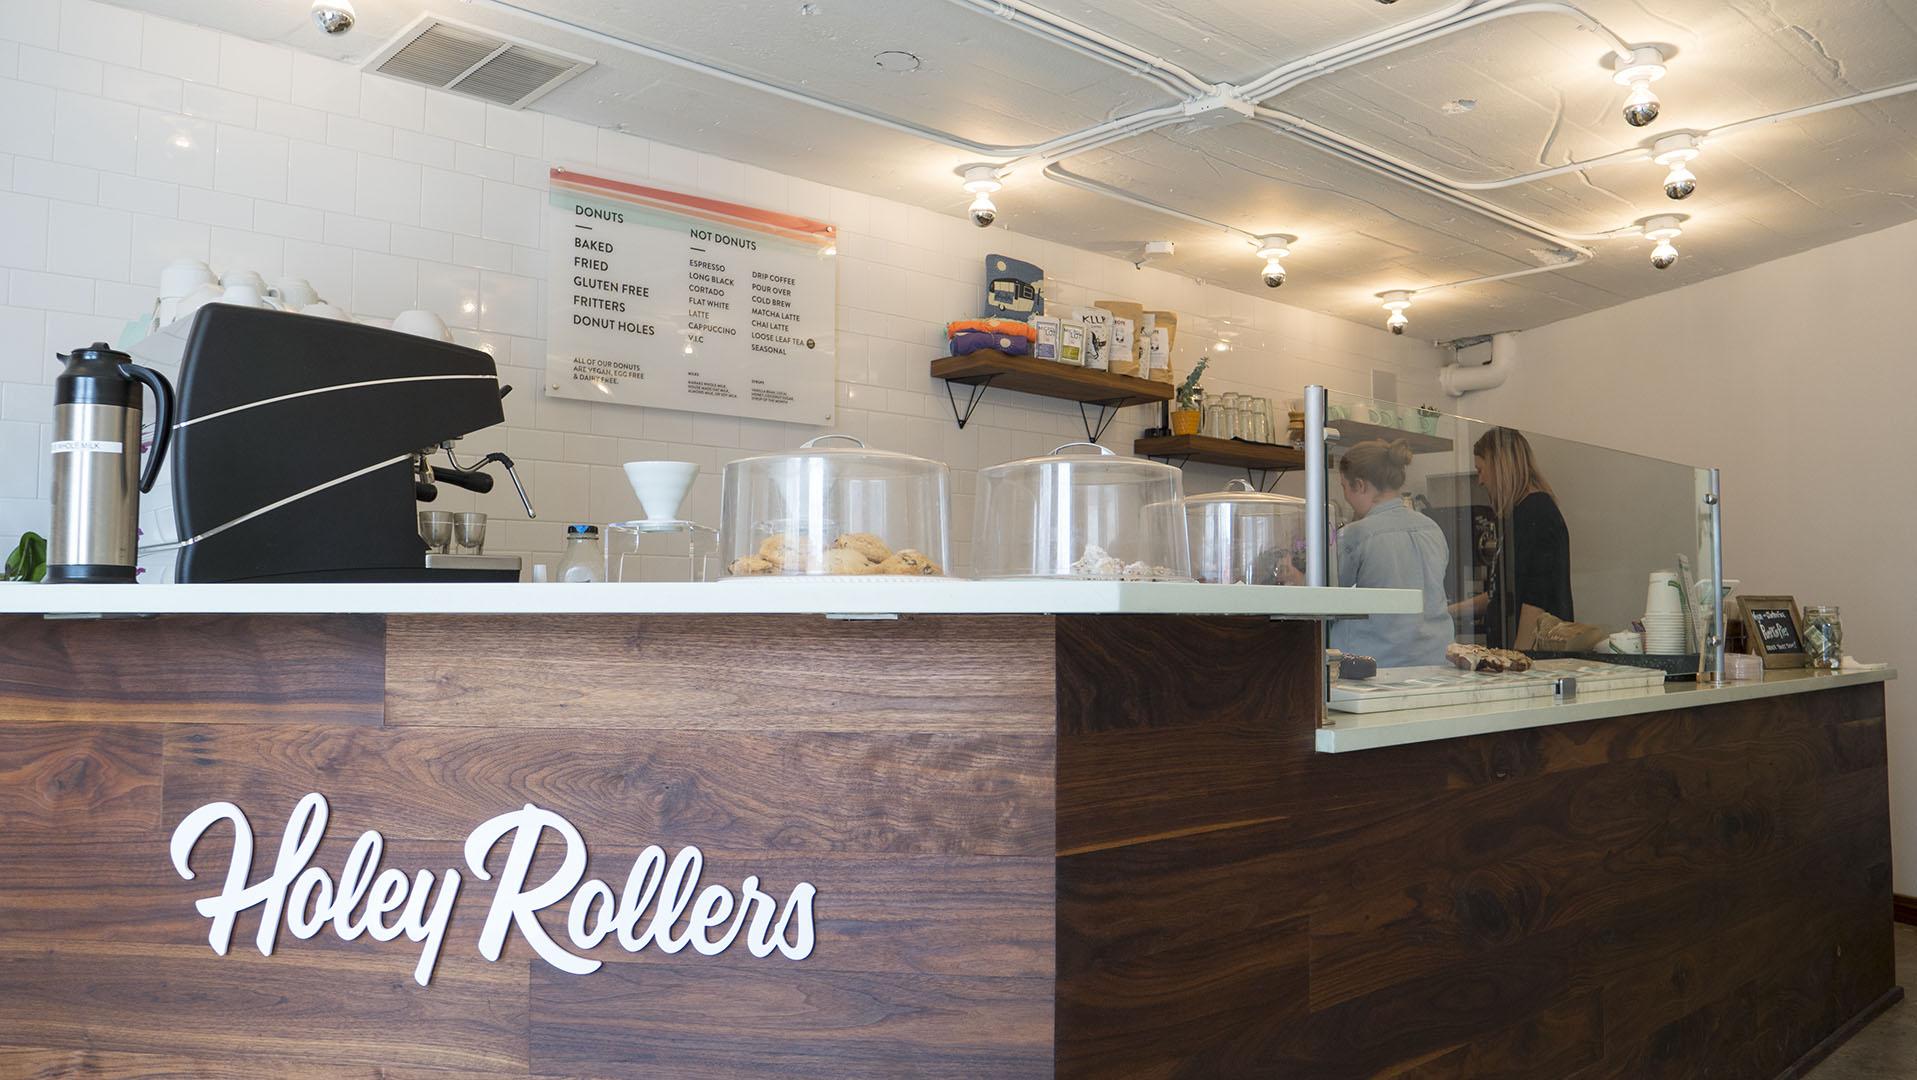 Inside Holey Rollers - photo by Dennis Spielman